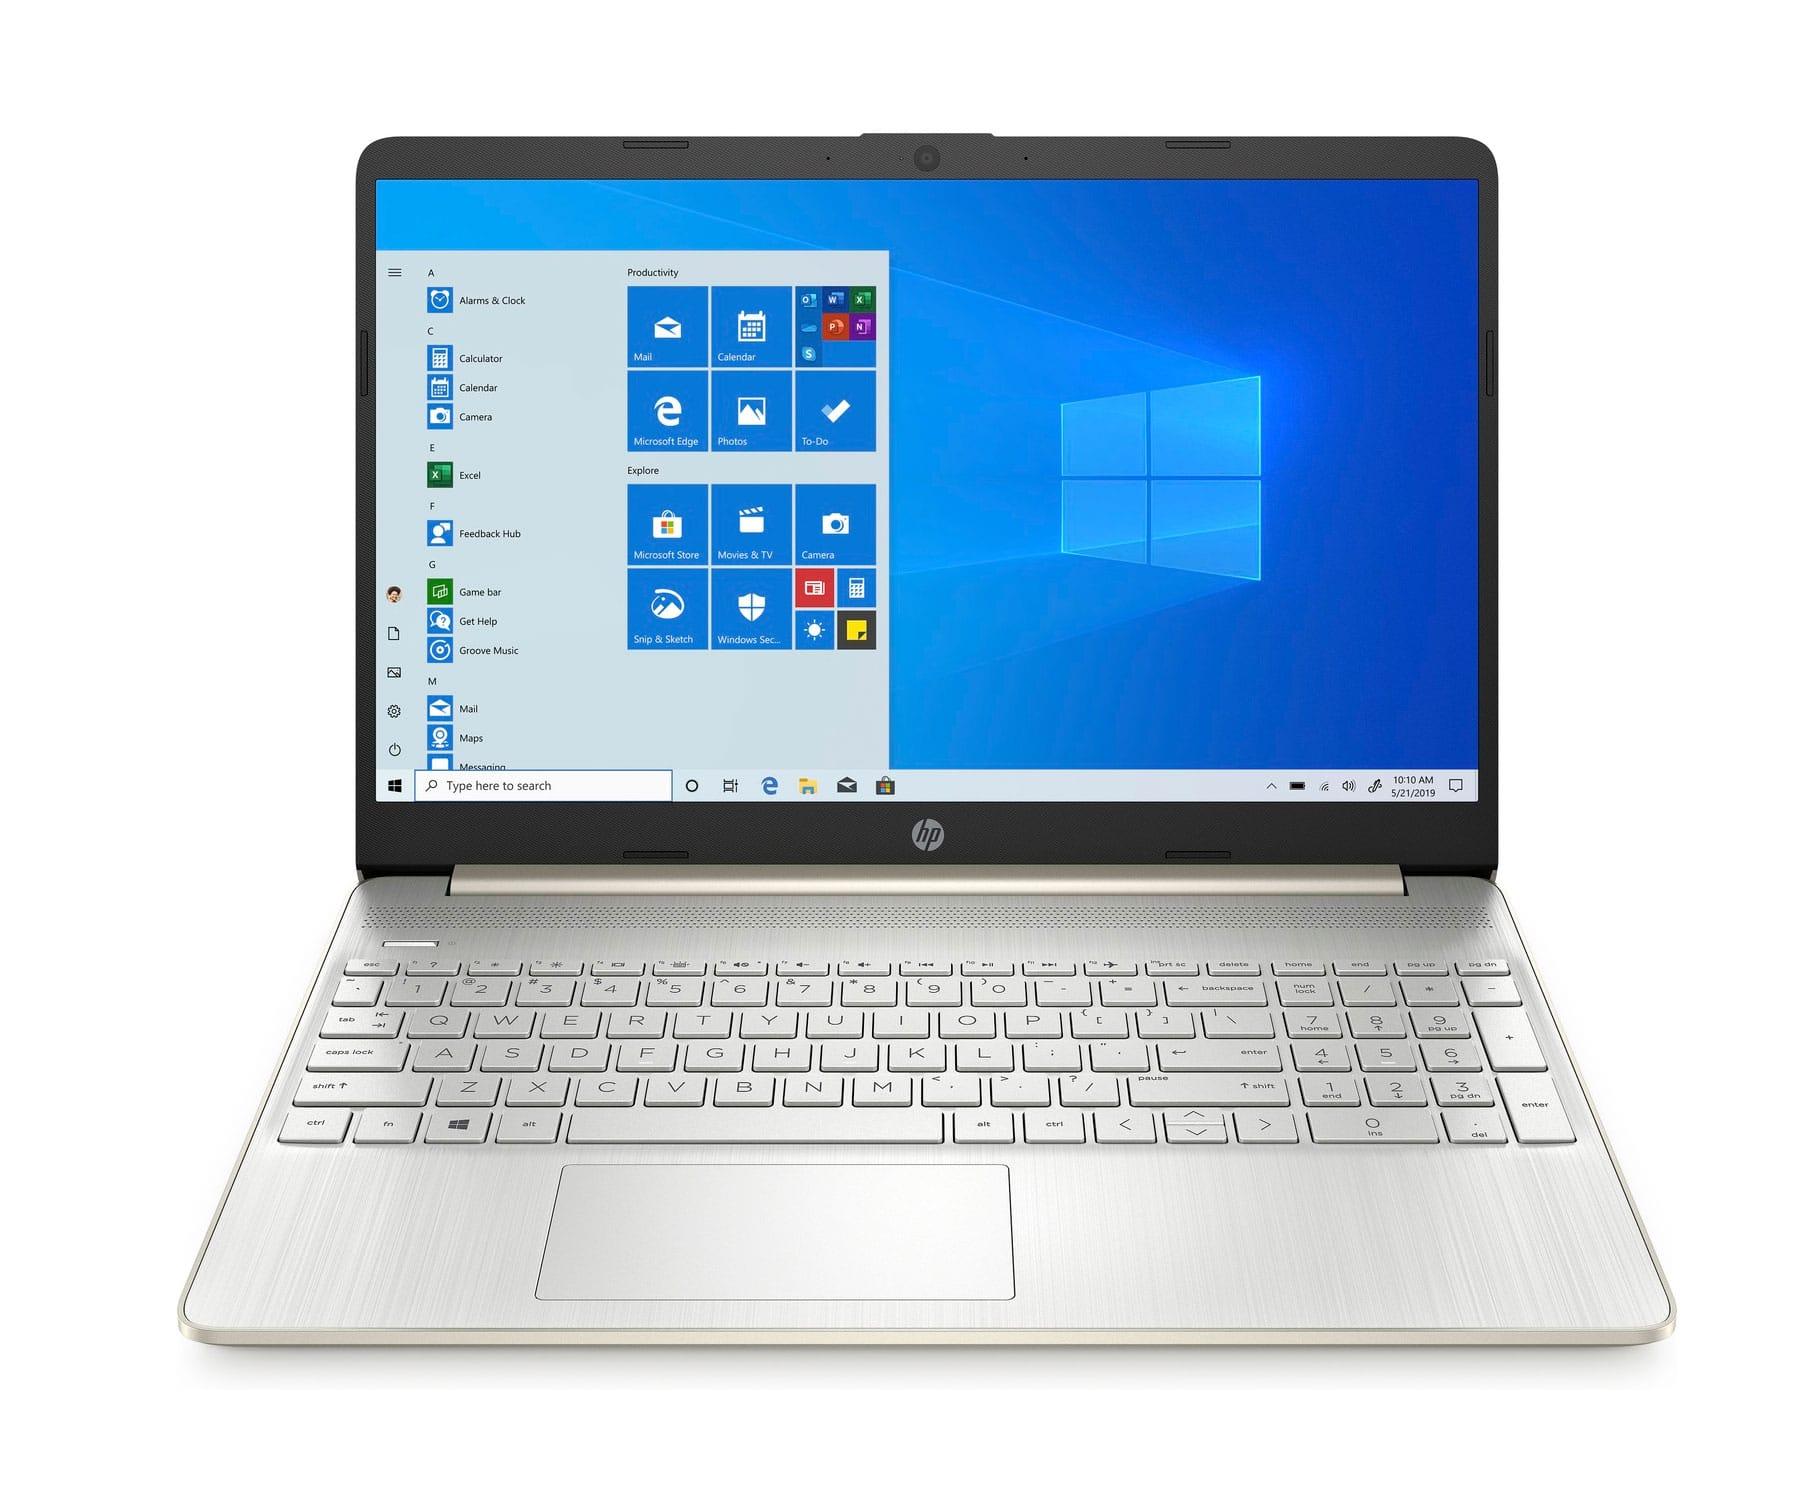 HP 15S-FQ2118 SILVER/ PORTÁTIL 15.6'' HD/ I3-1115G4/ 512 GB SSD/8GB RAM/WINDOWS 10 HOME 64